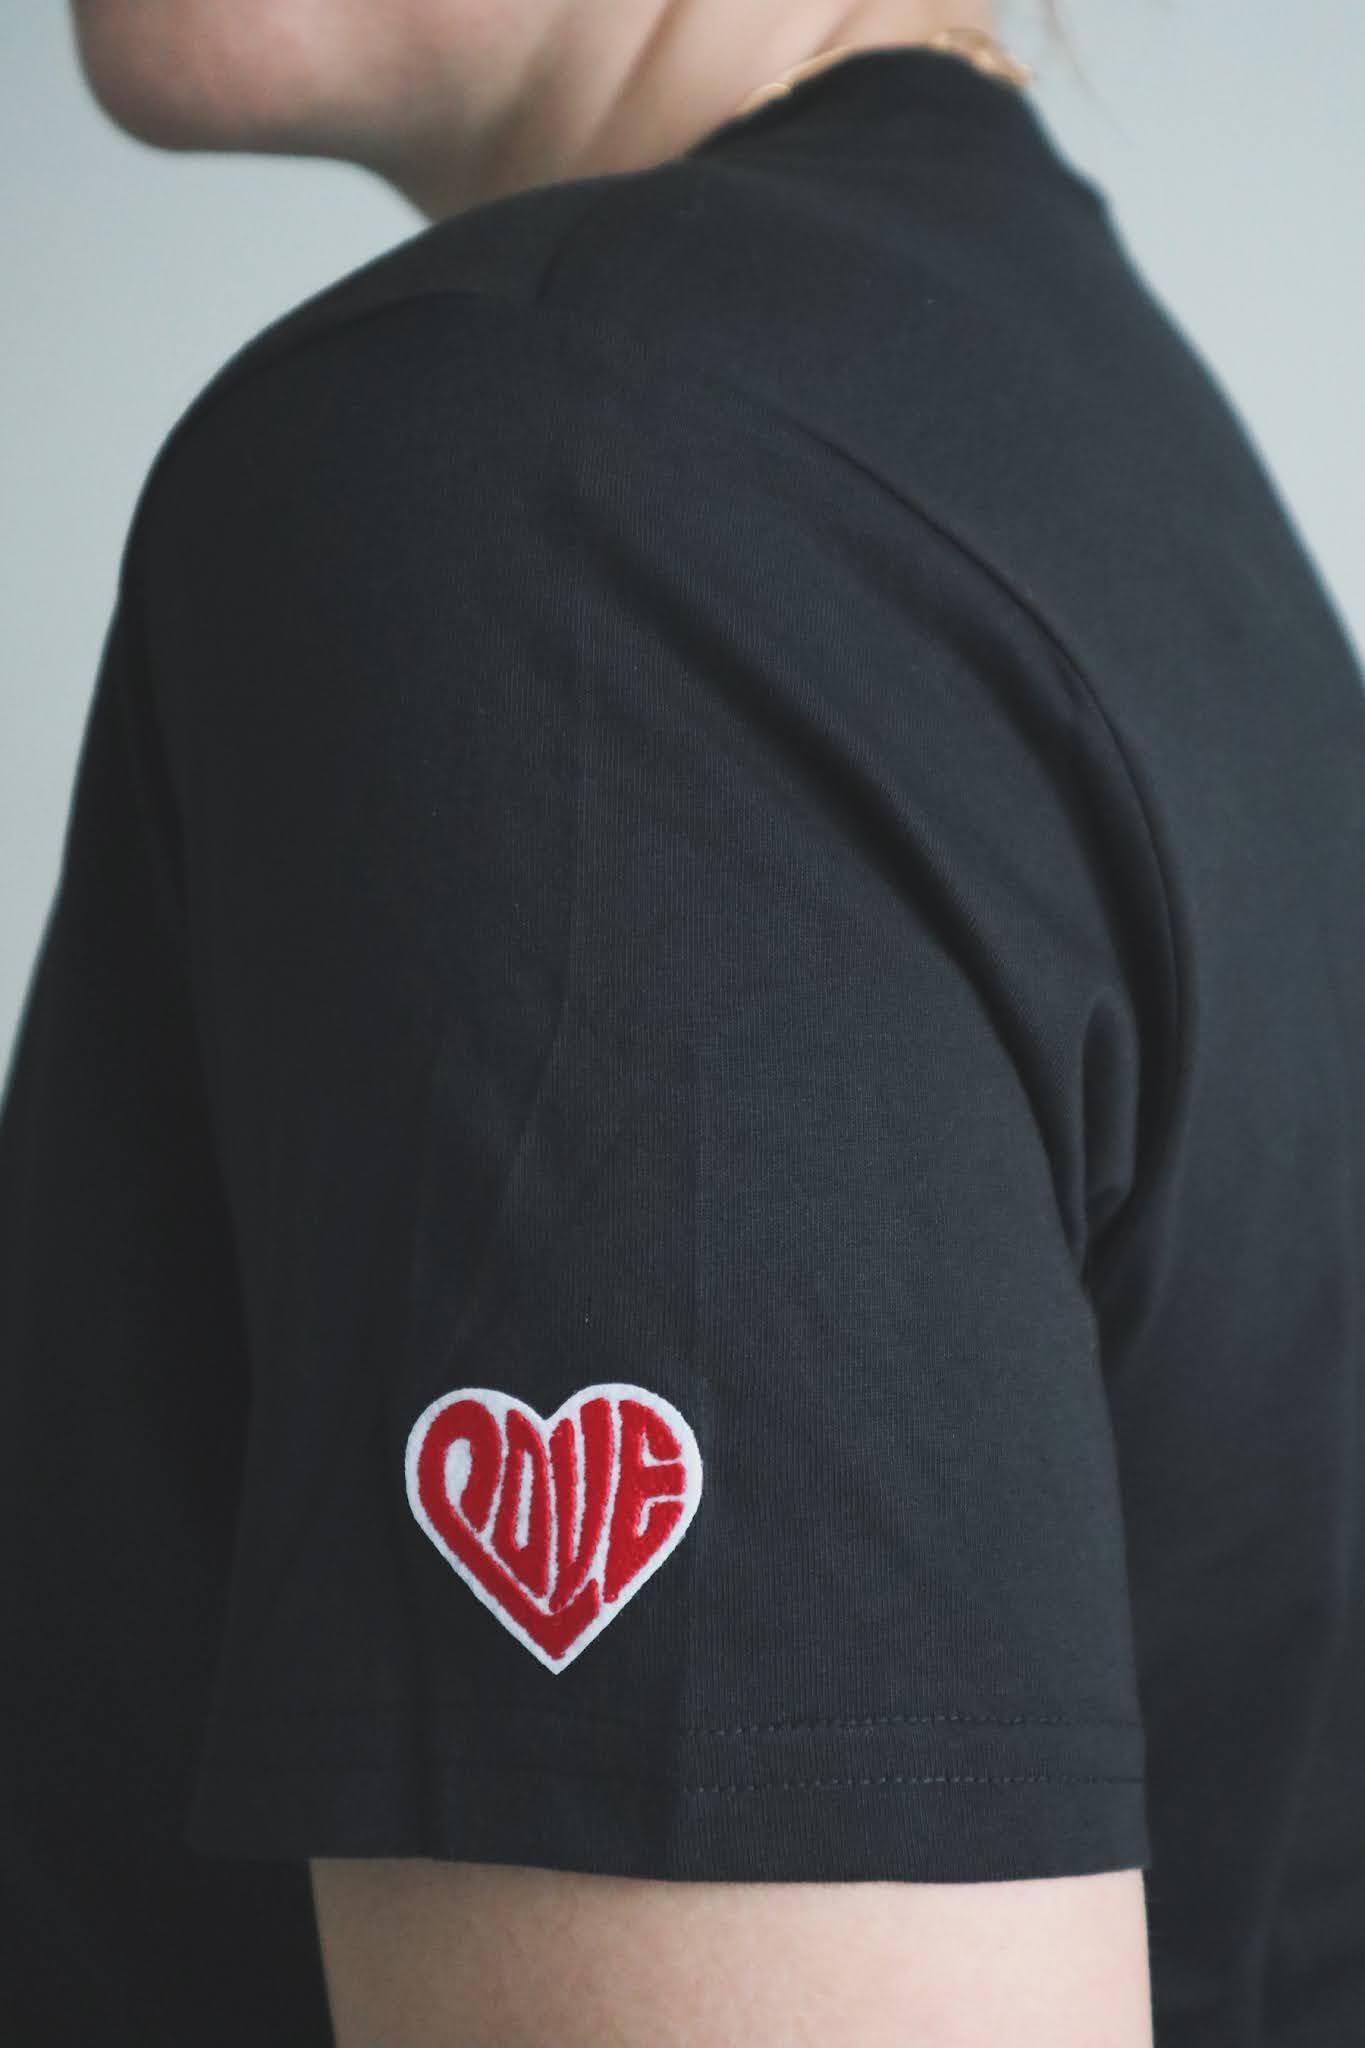 Michael Kors Watch Hunger Stop tshirt 2021